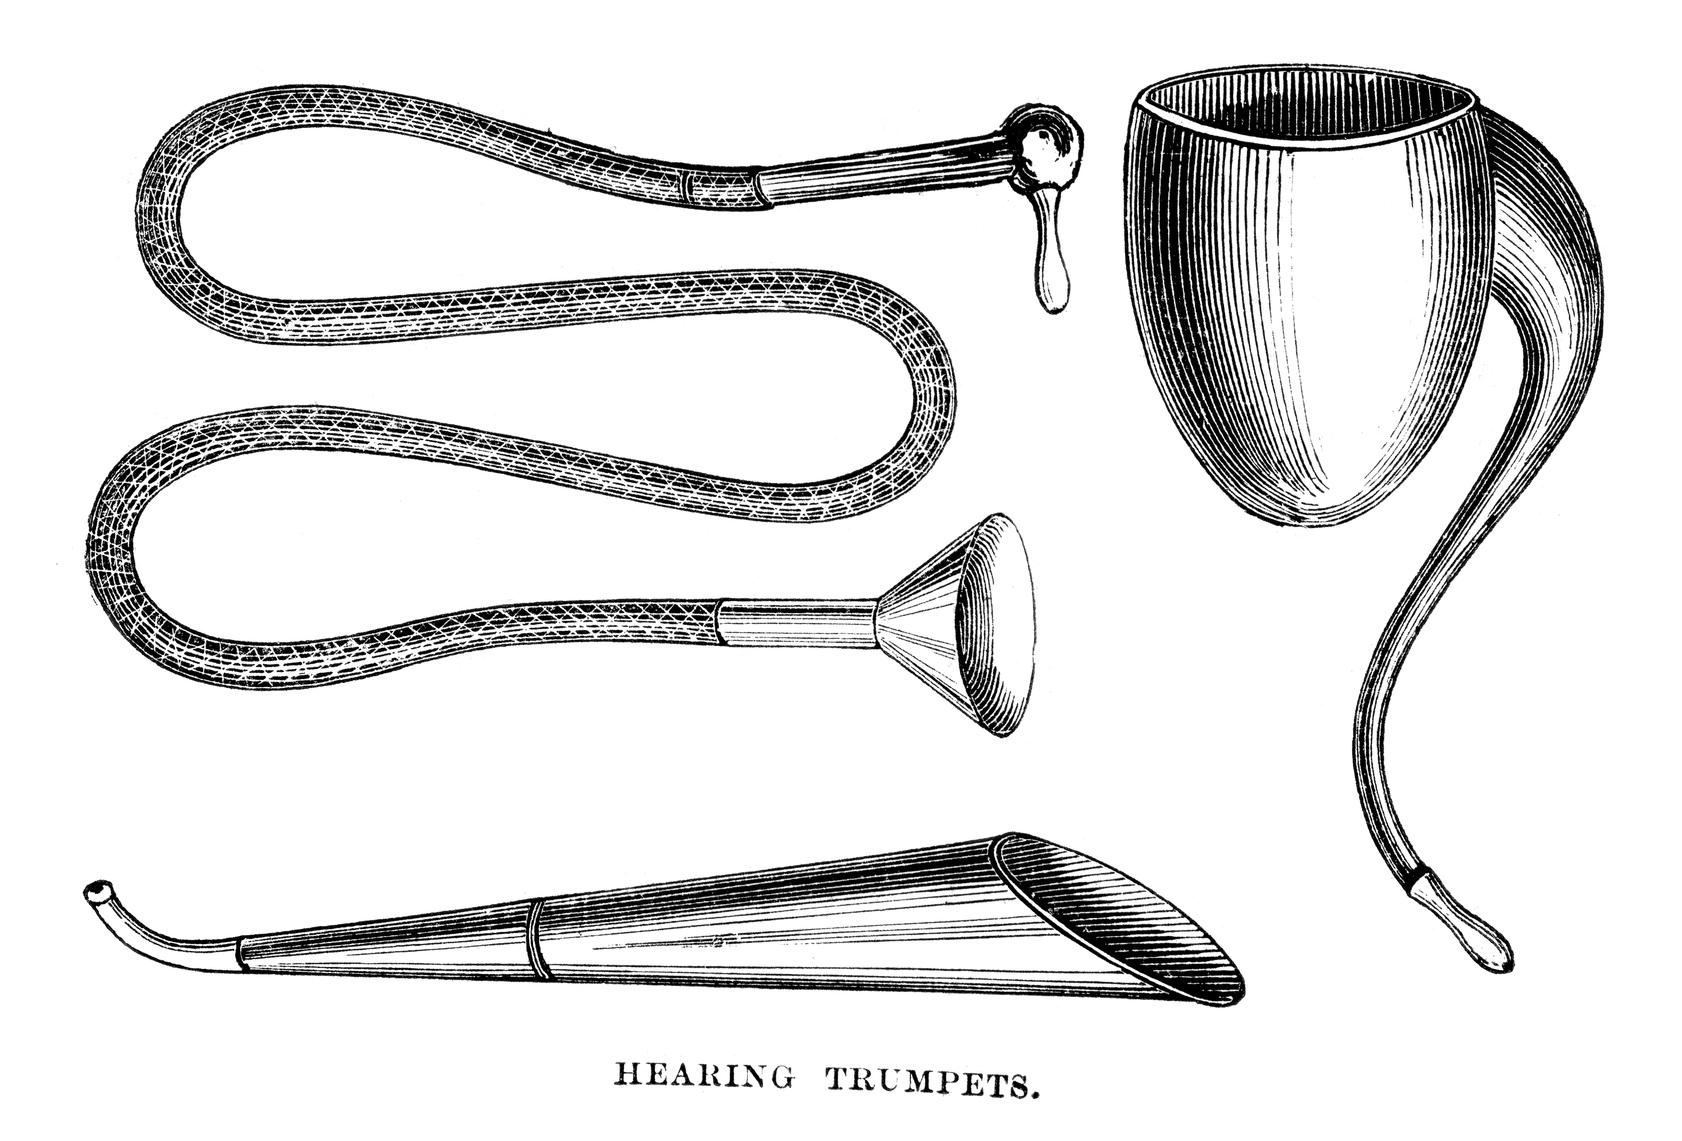 hearing-trumpets-1471363509.jpg